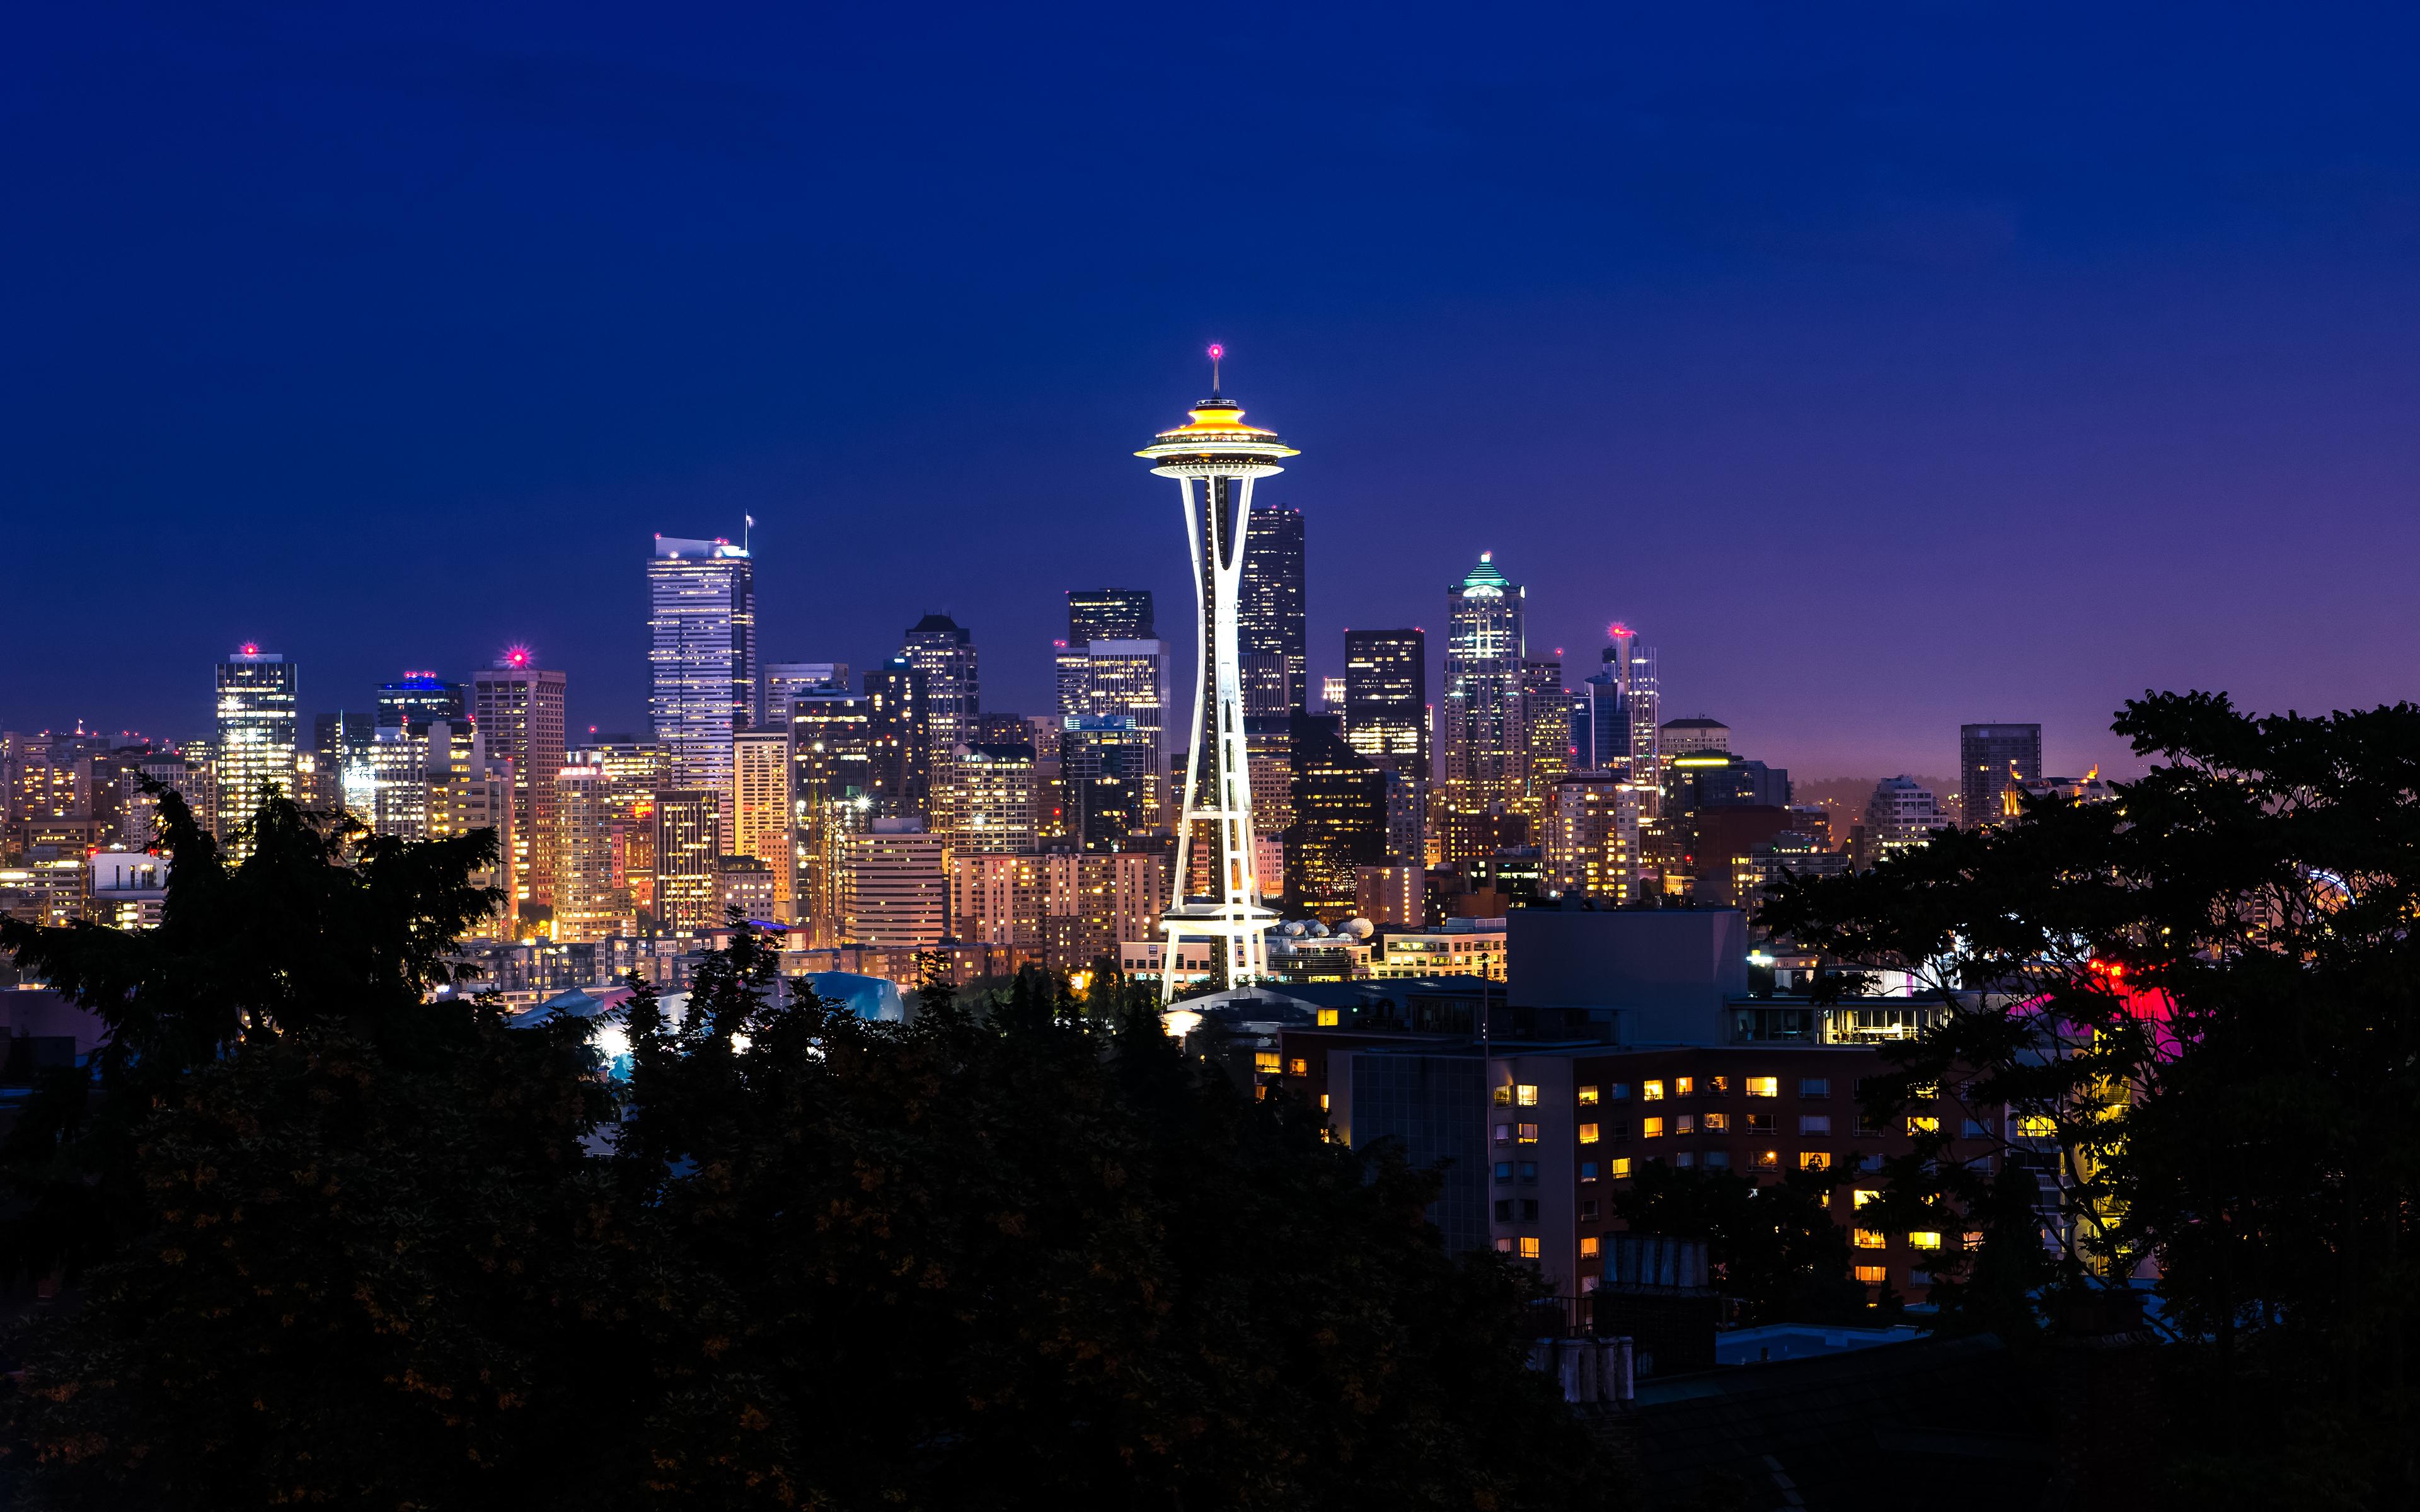 South Lake Union in Seattle(SLU) Район в Сиэтле Часть